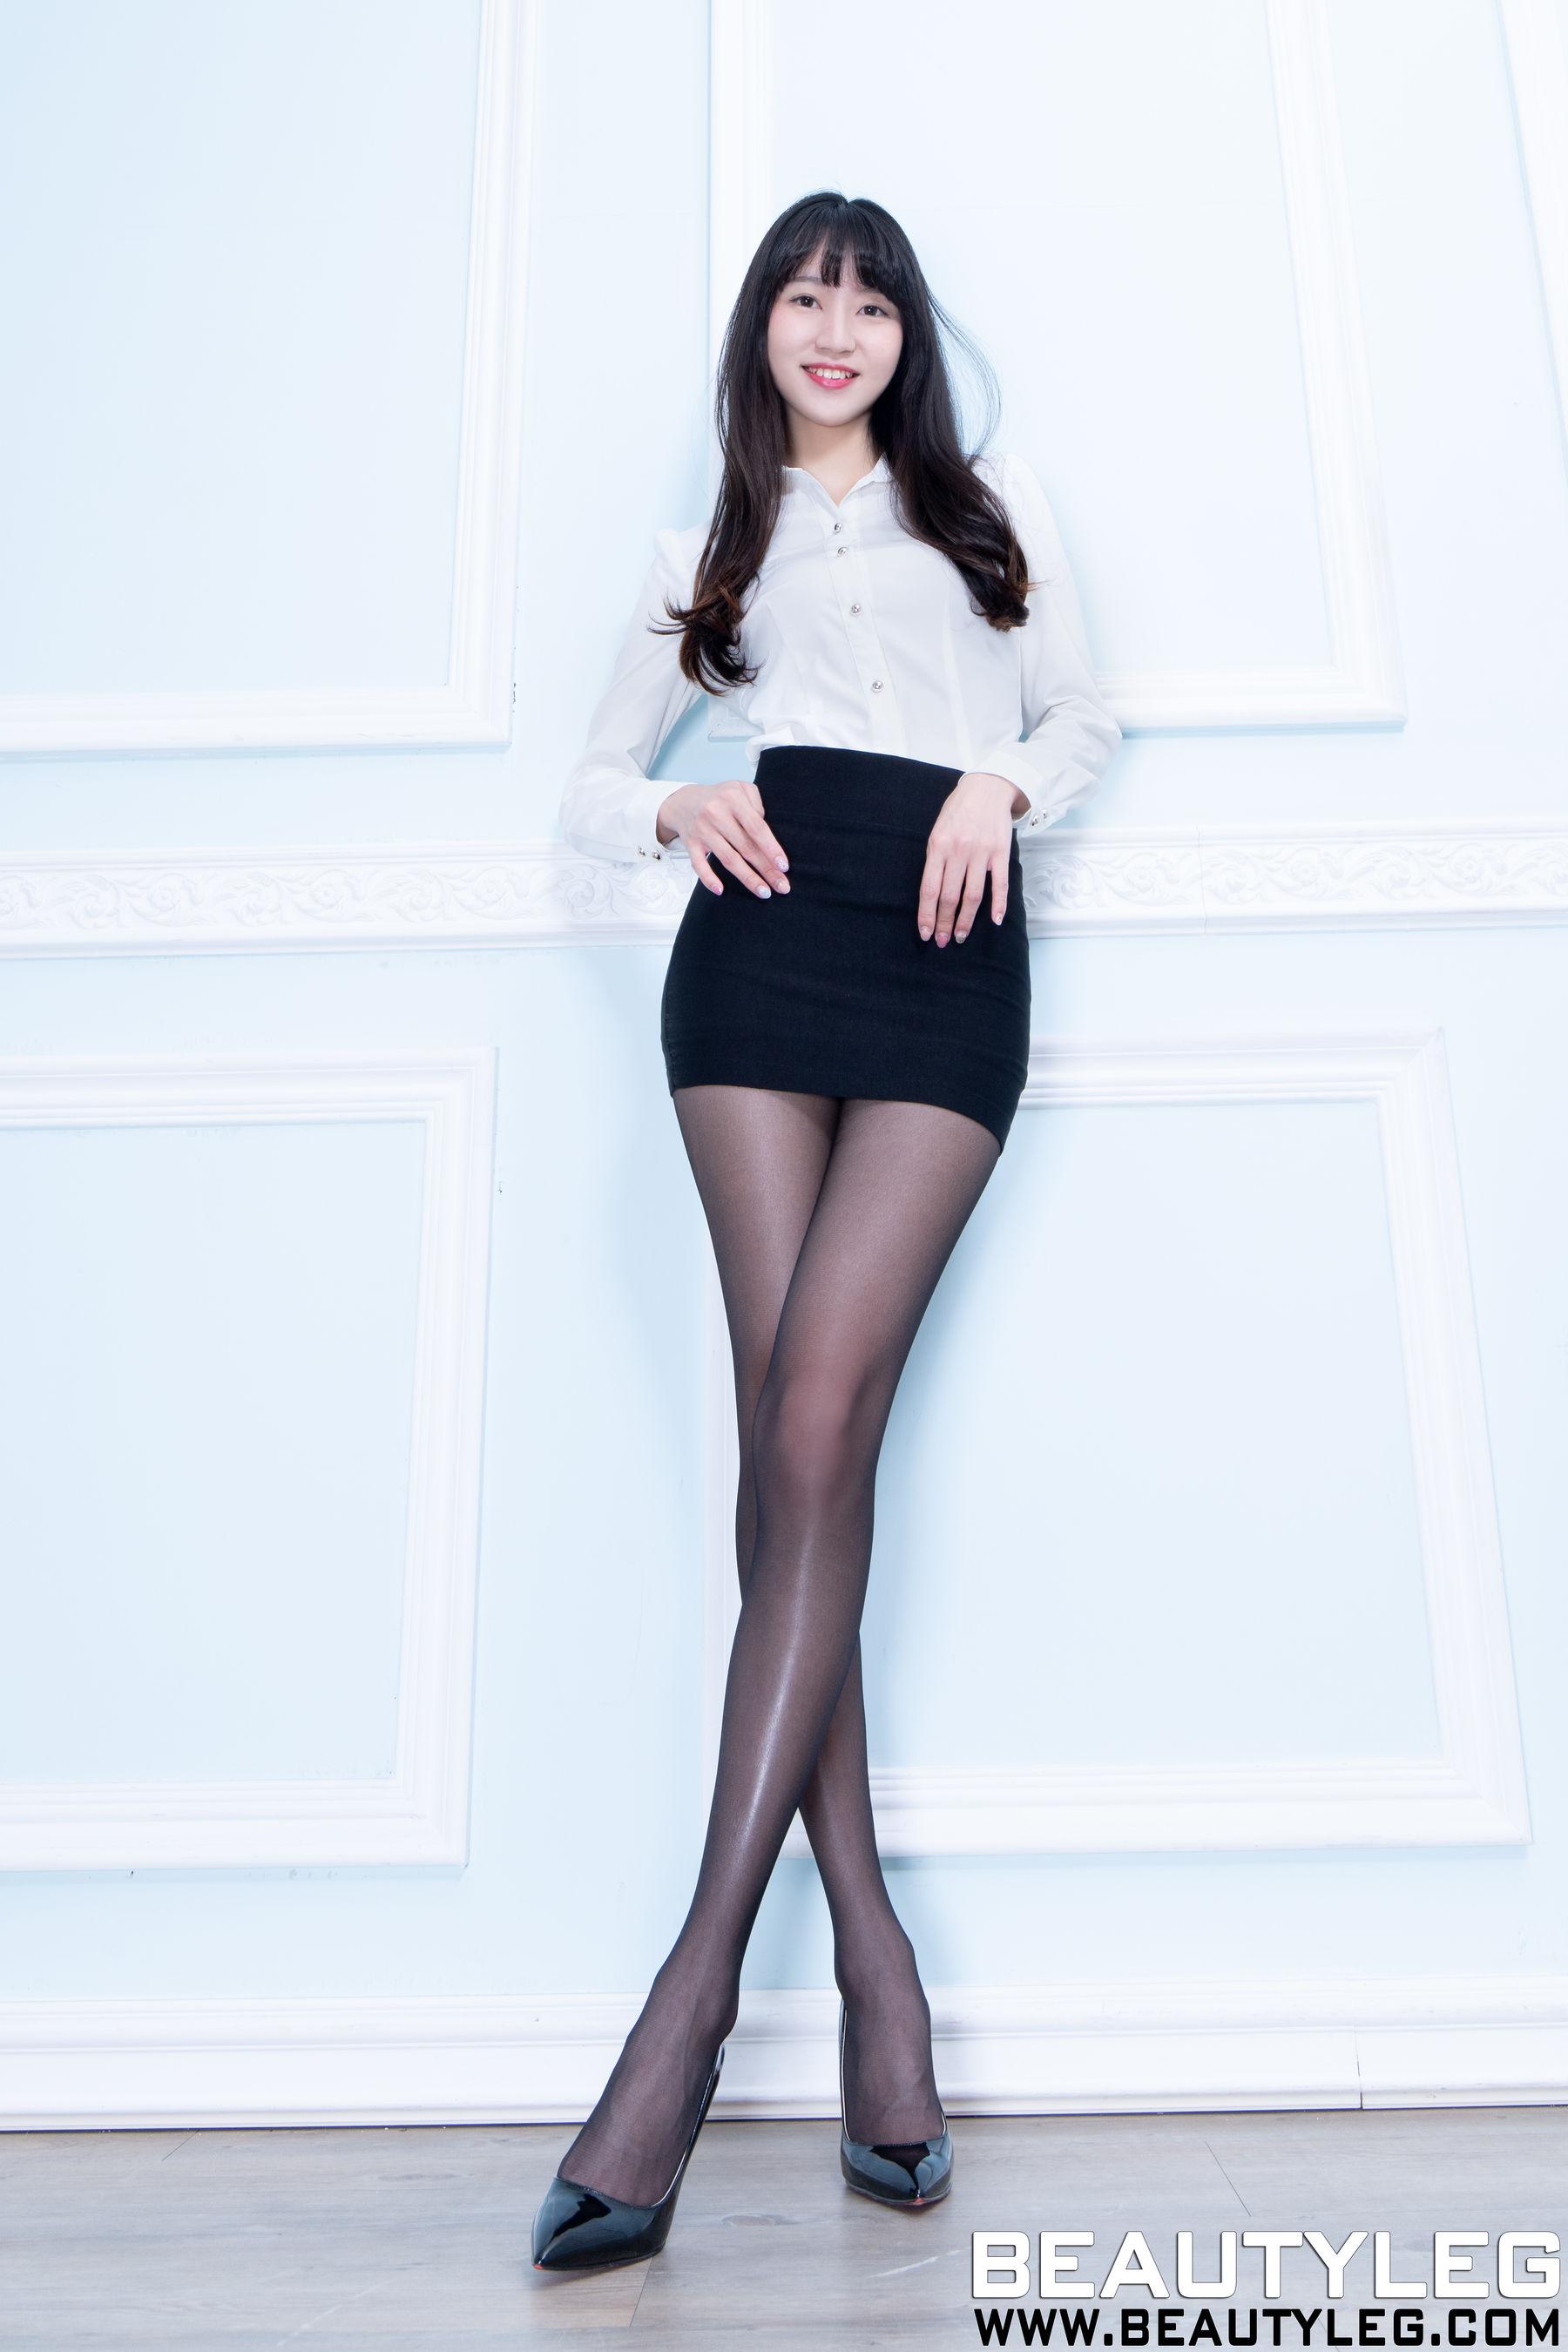 VOL.459 [Beautyleg]美腿黑丝美腿:腿模JoJo(Beautyleg JoJo)超高清个人性感漂亮大图(45P)